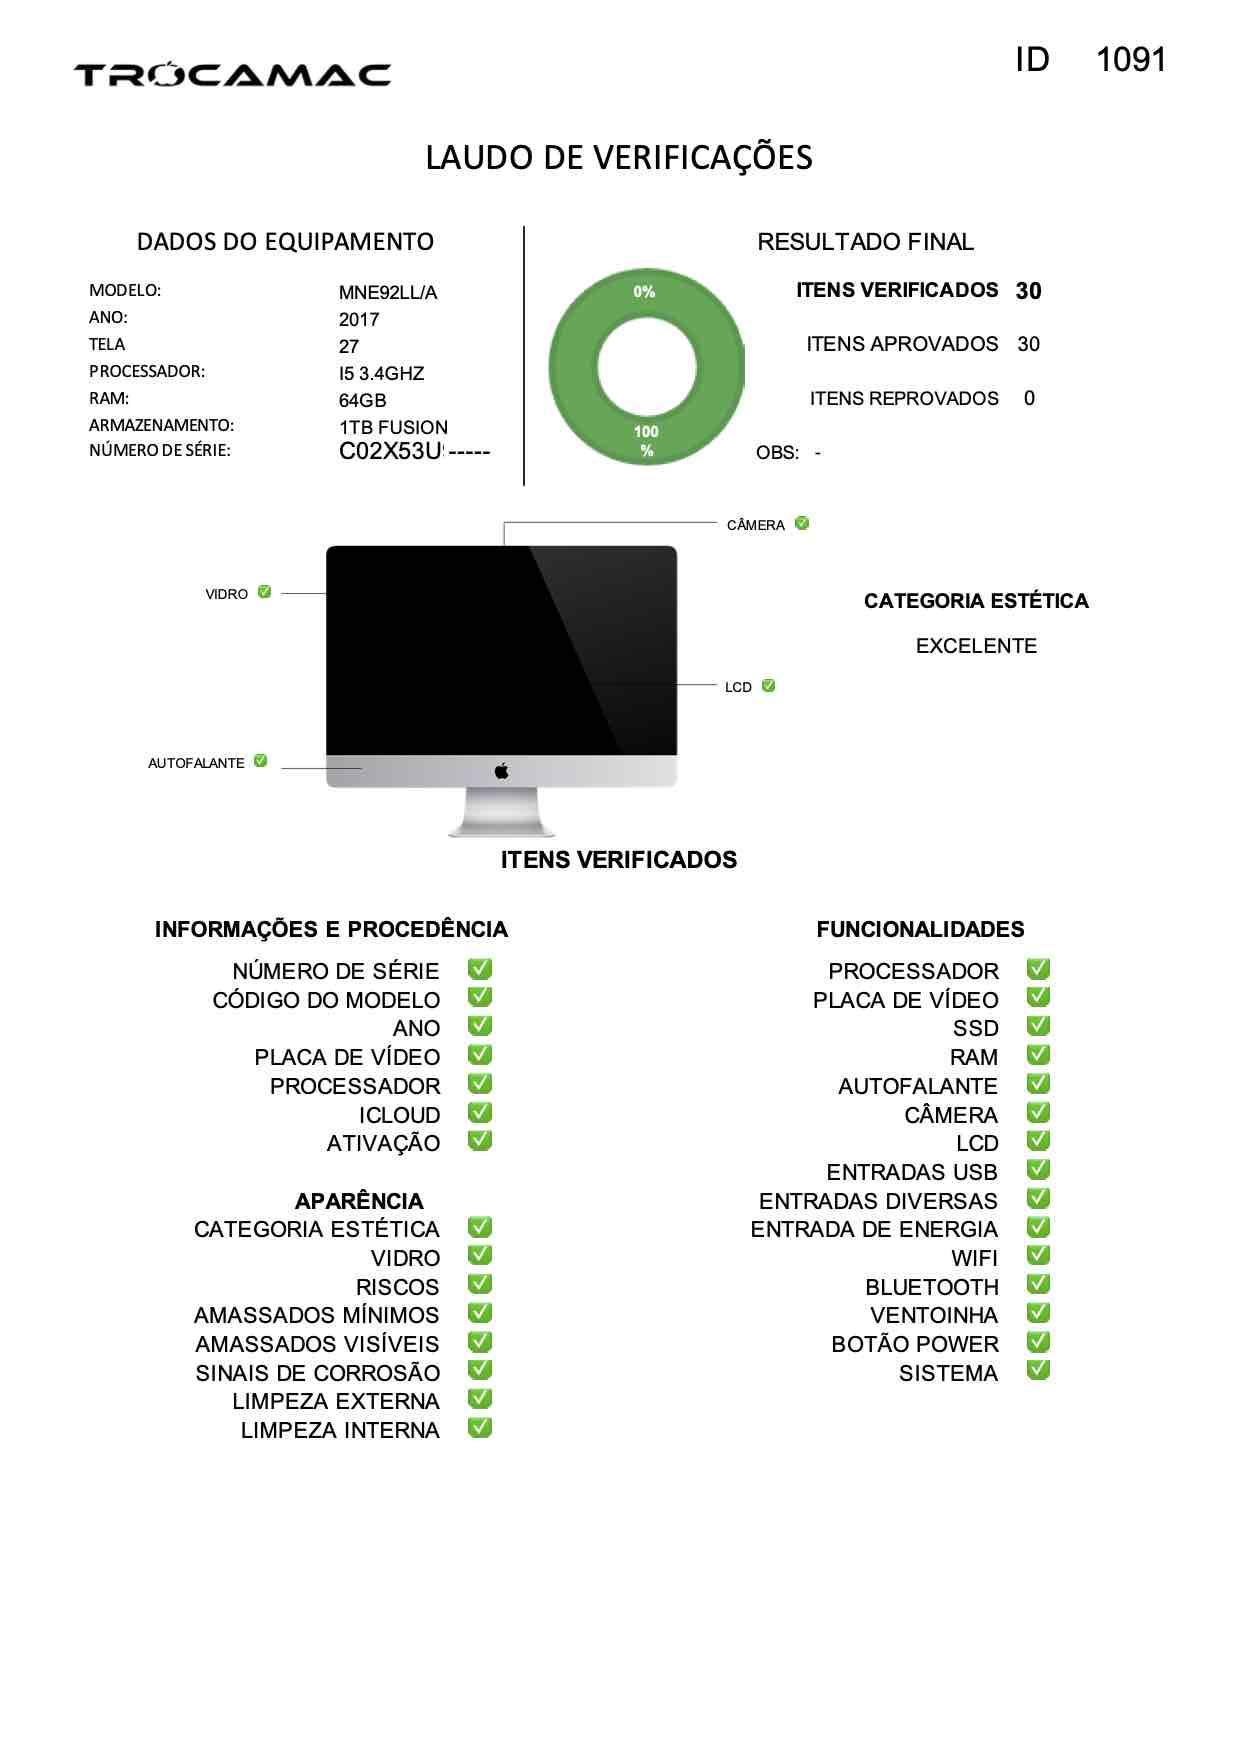 Imac 27 5K I5 3.4ghz 64gb 1tb Fusion Mne92ll/a Seminovo